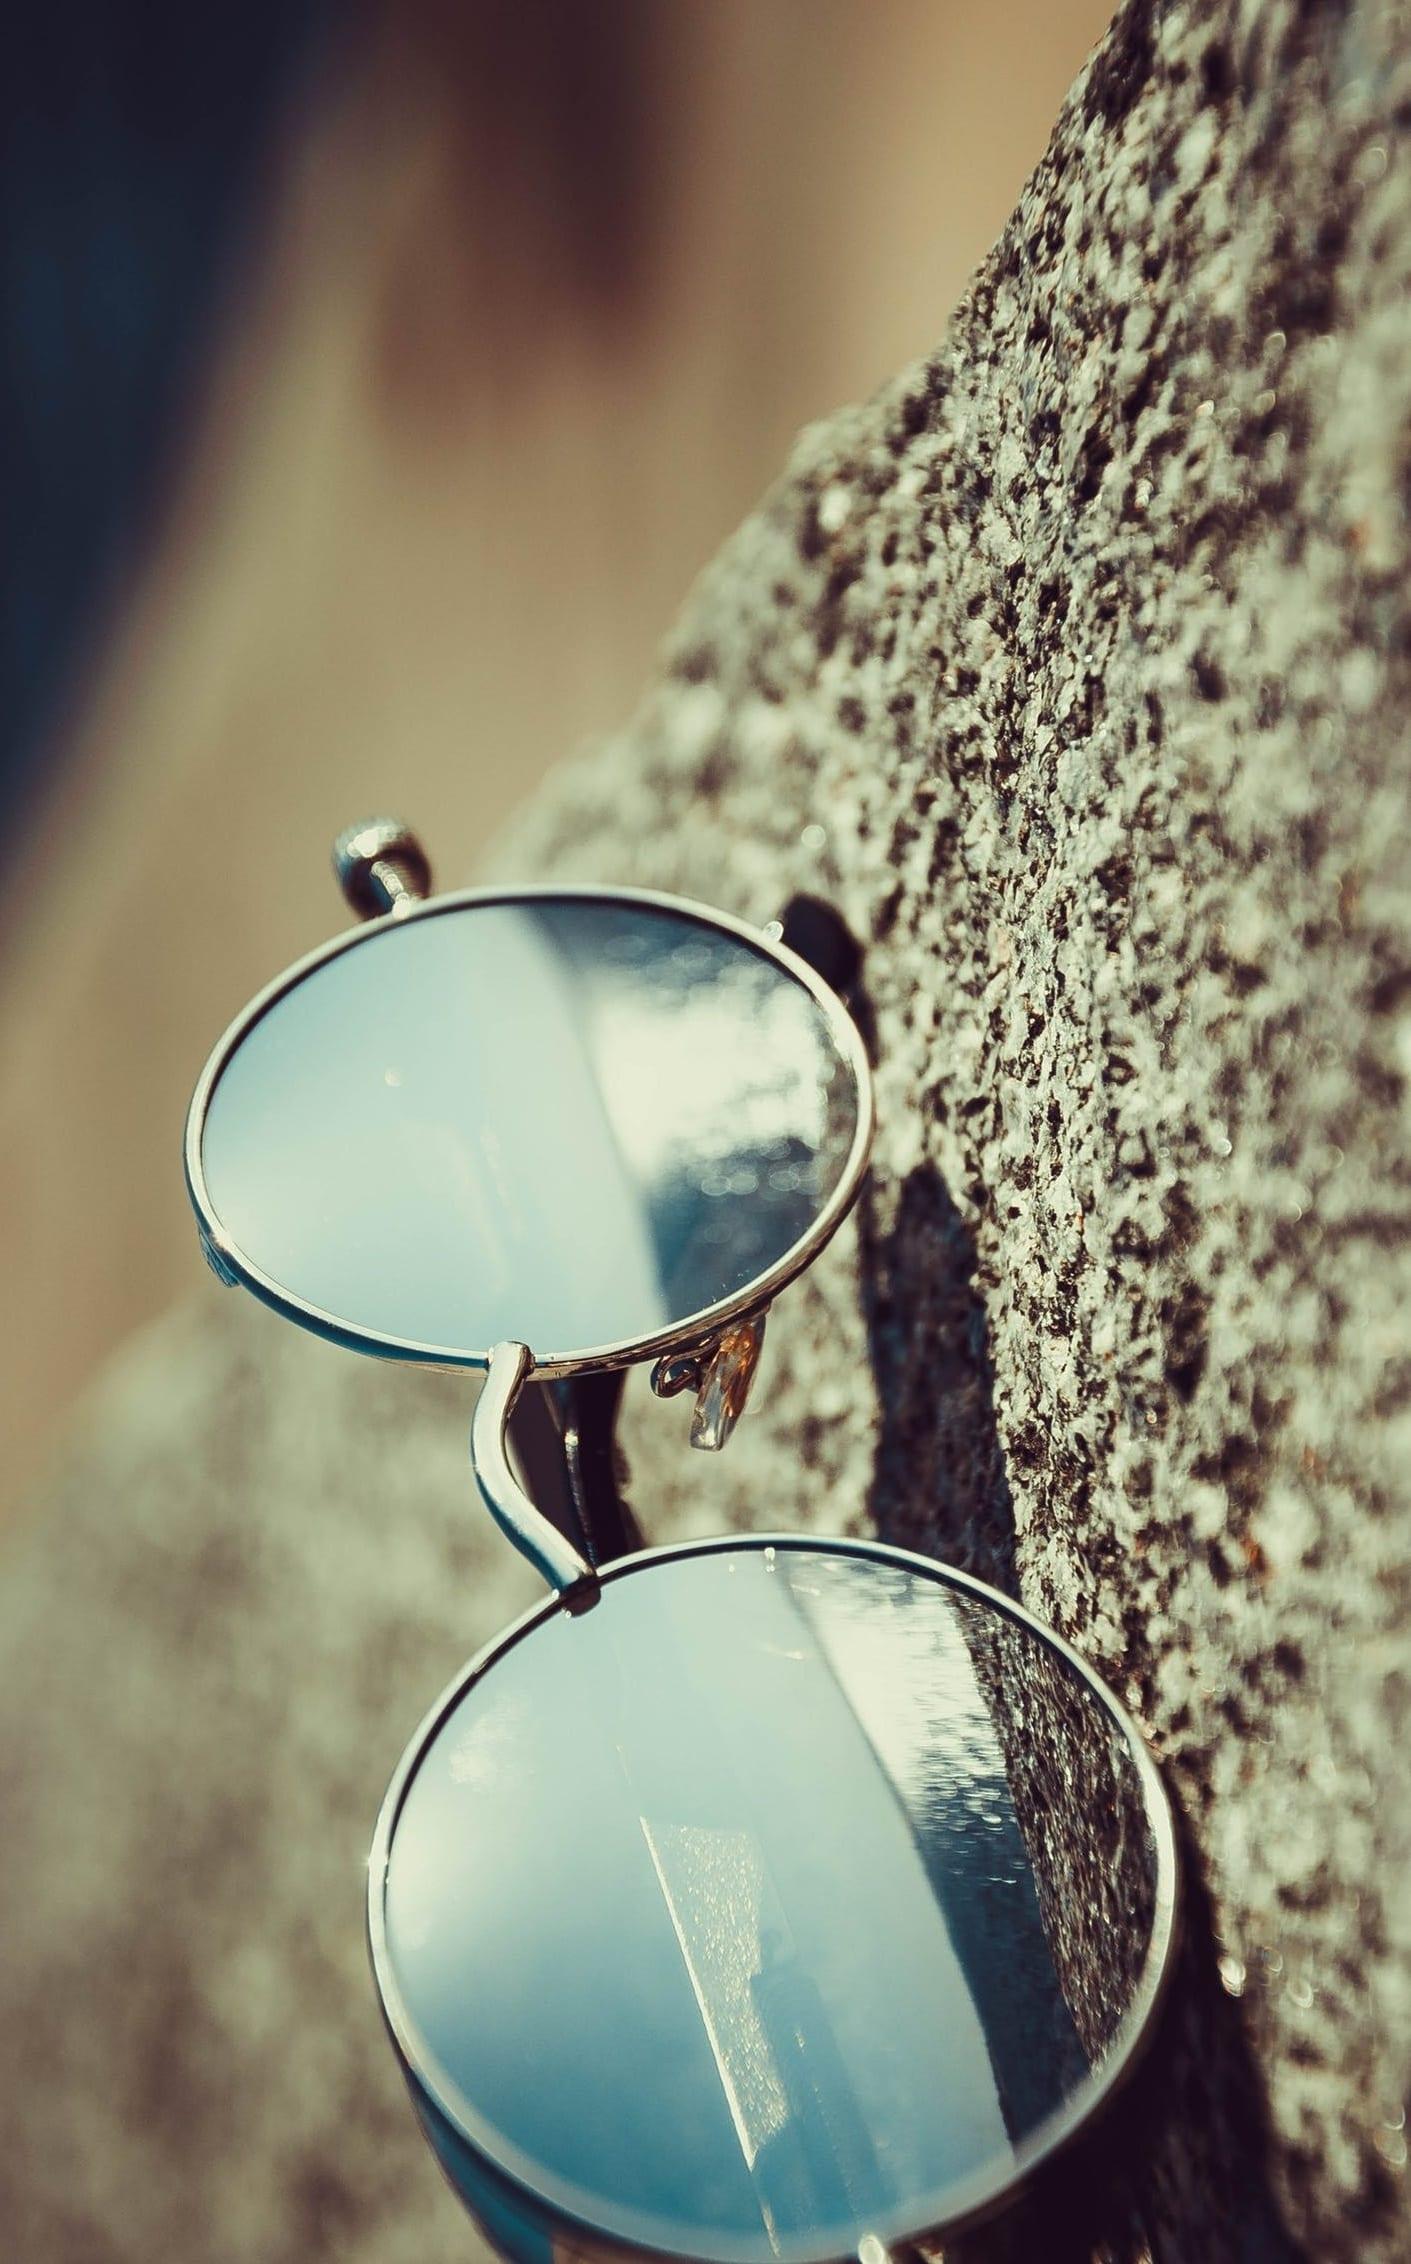 classy mirrored lense